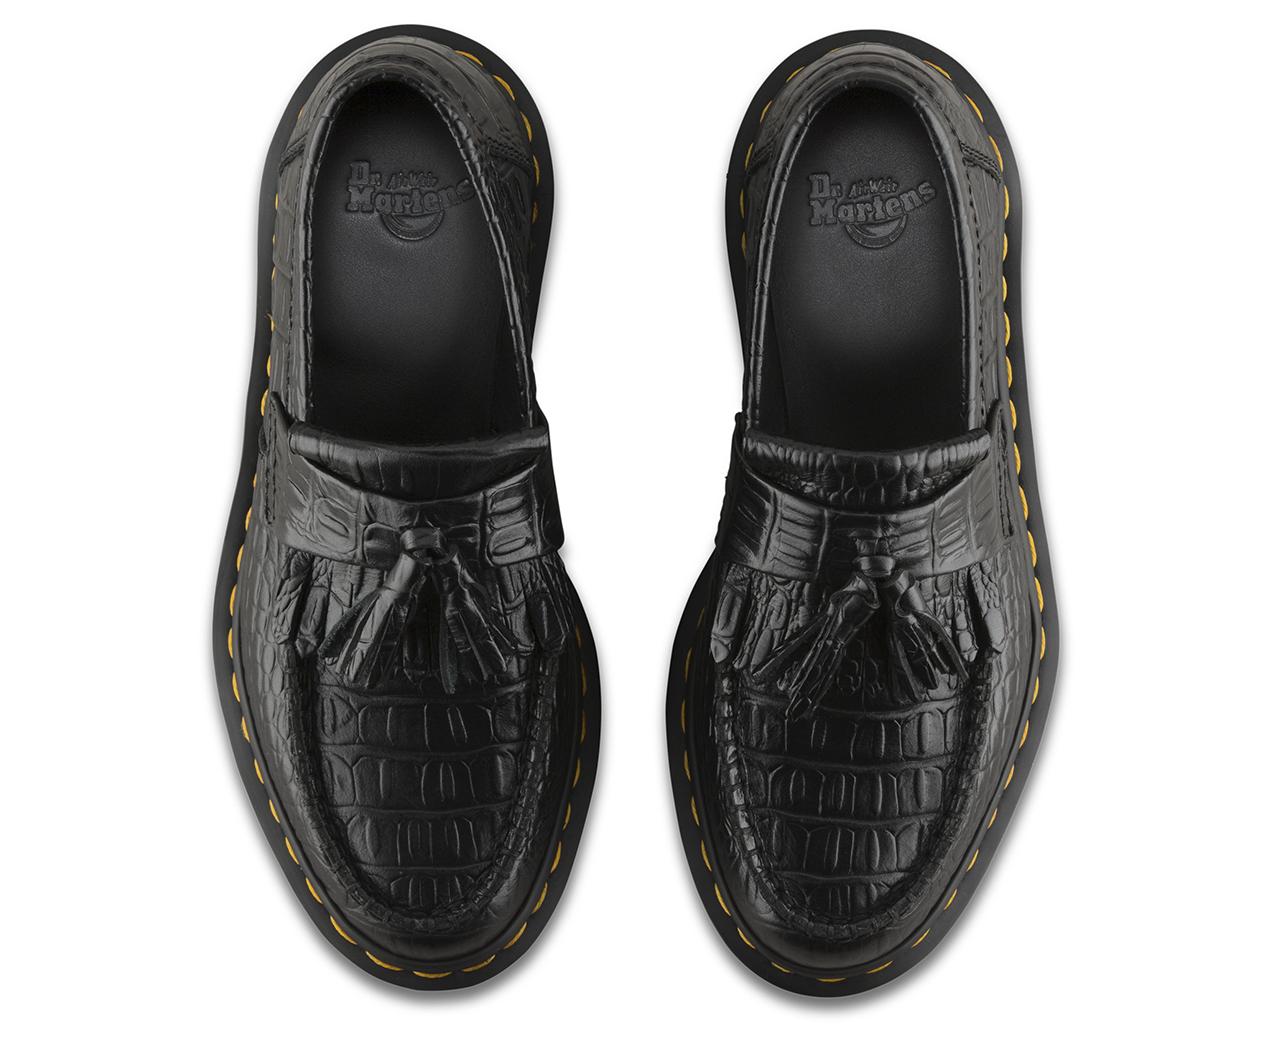 Adrian CROC New Vibrance Croco 黑色 22762001